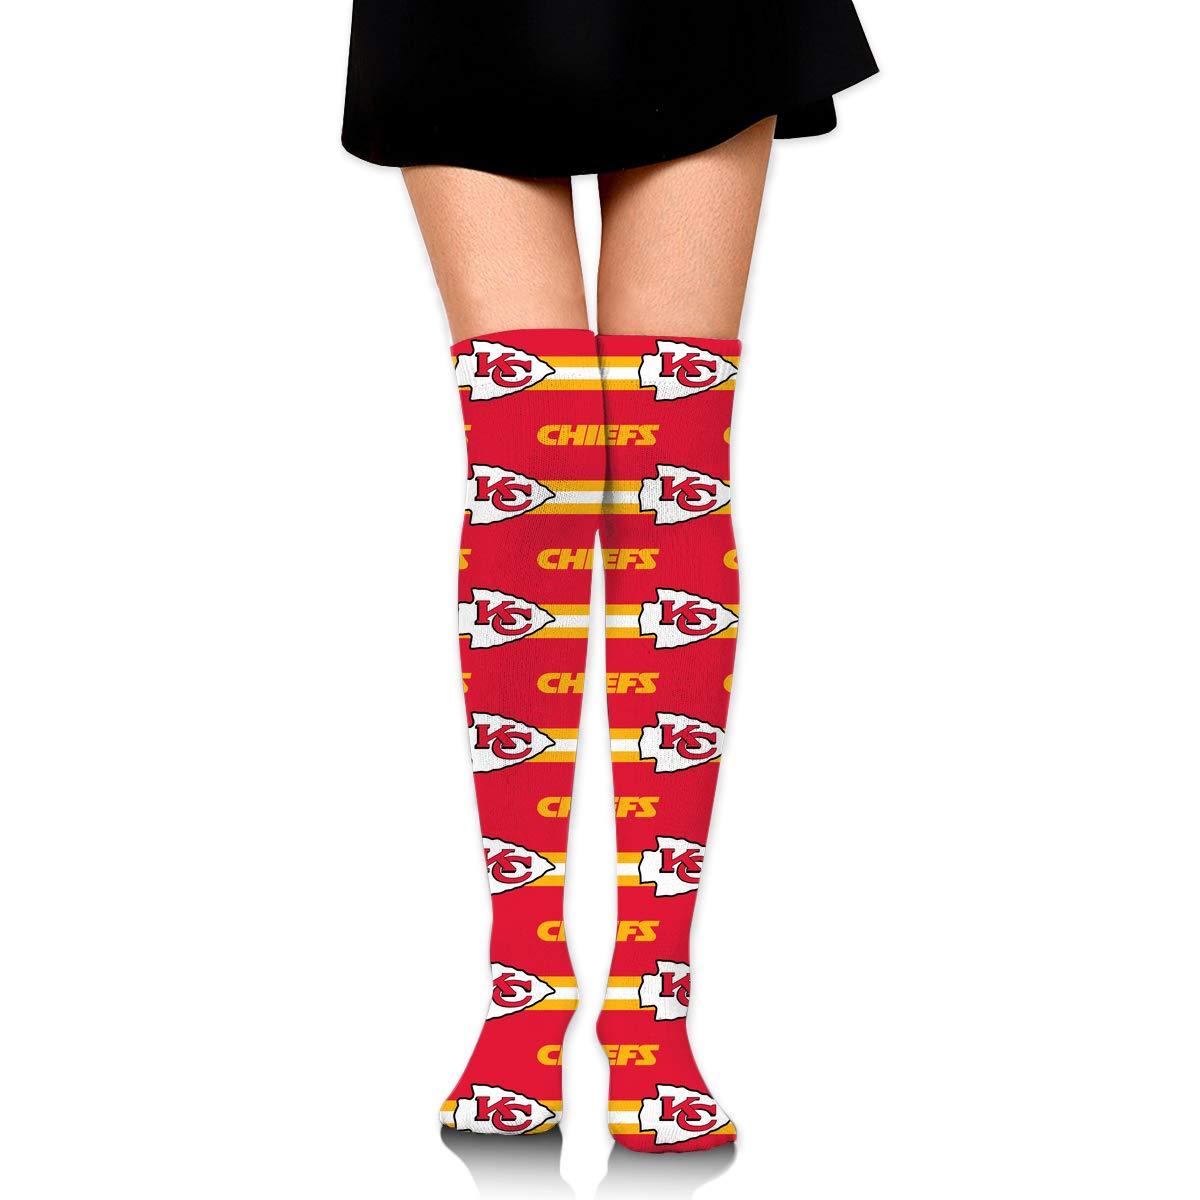 Sorcerer Custom Girls Over Knee High Boot Stockings Leg Warmers Kansas City Chiefs Women's Polyester Thigh High Socks Gift by Sorcerer